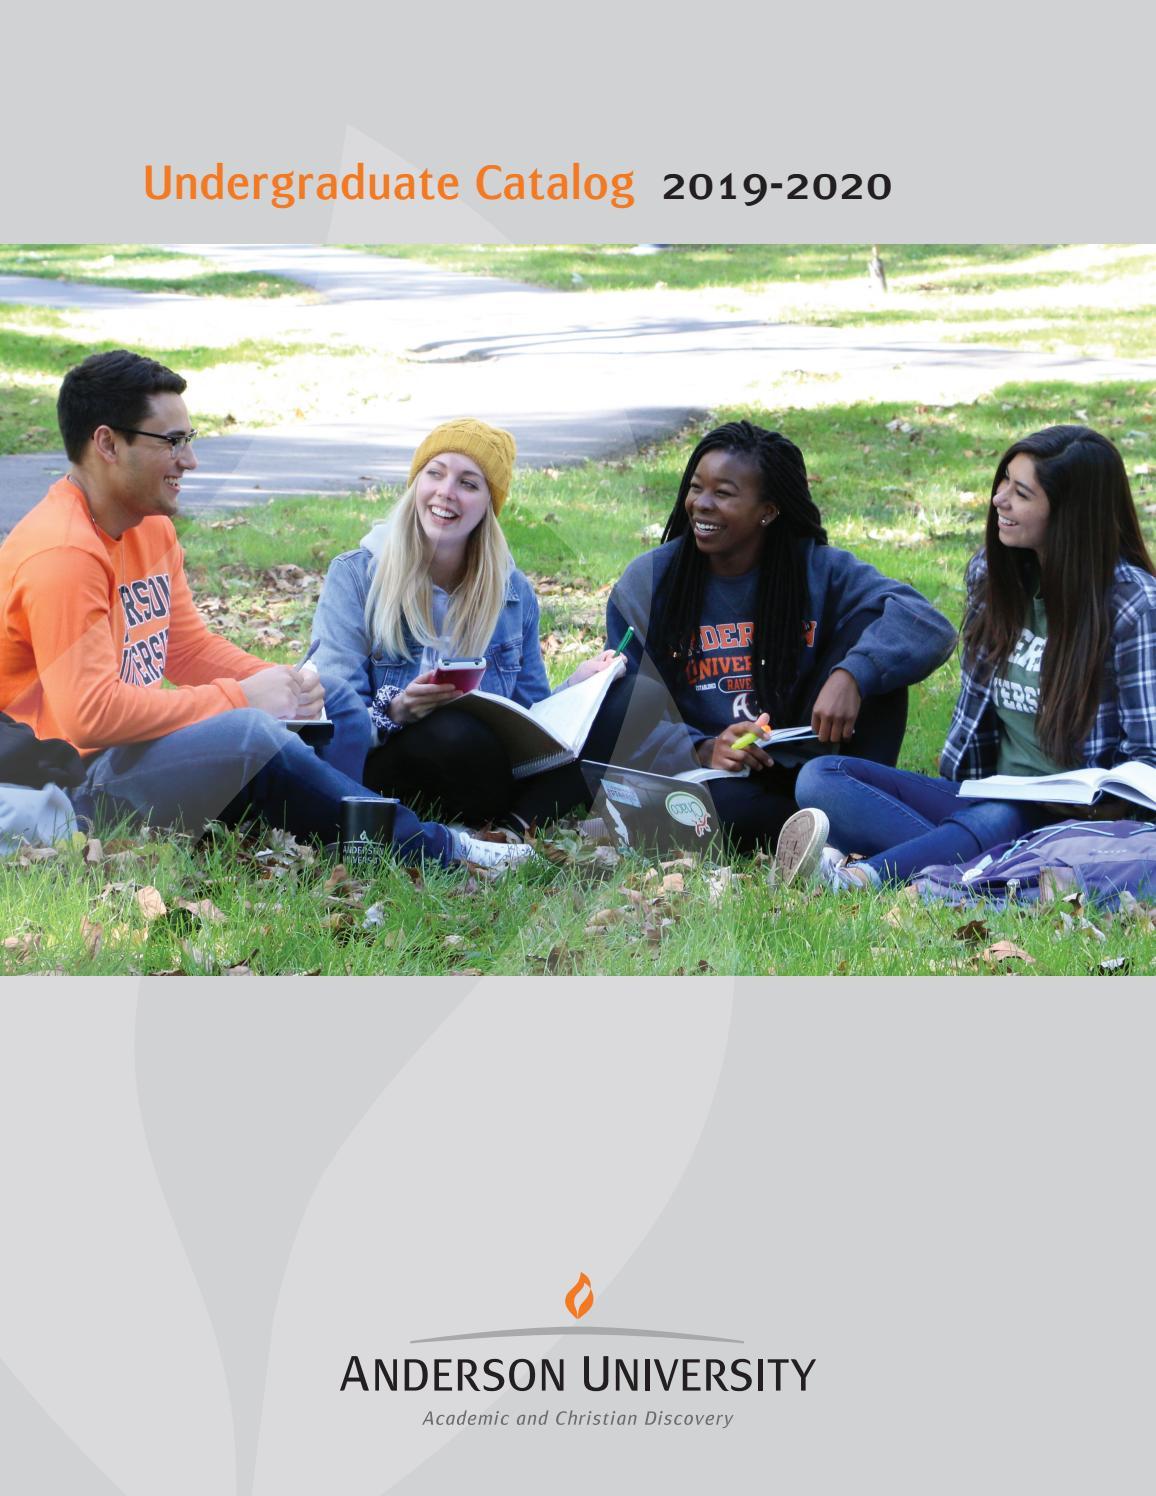 Carnegie Mellon Academic Calendar 2020-21 Anderson University Undergraduate Catalog 2019 20 by Anderson